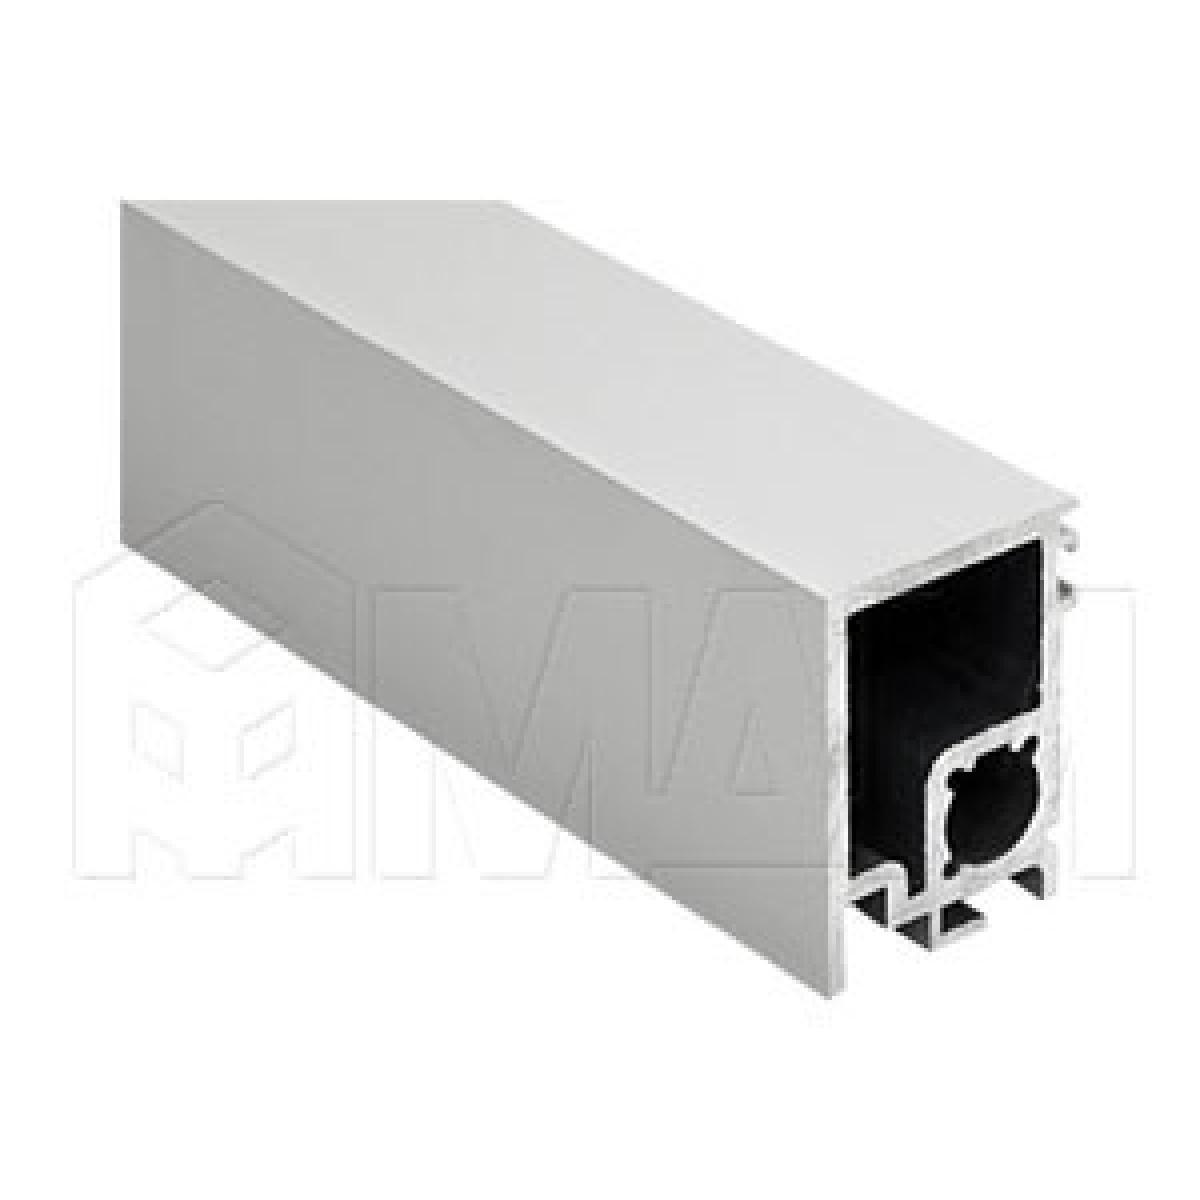 PS19.5 Вертик. профиль узкий, серебро, L-6100